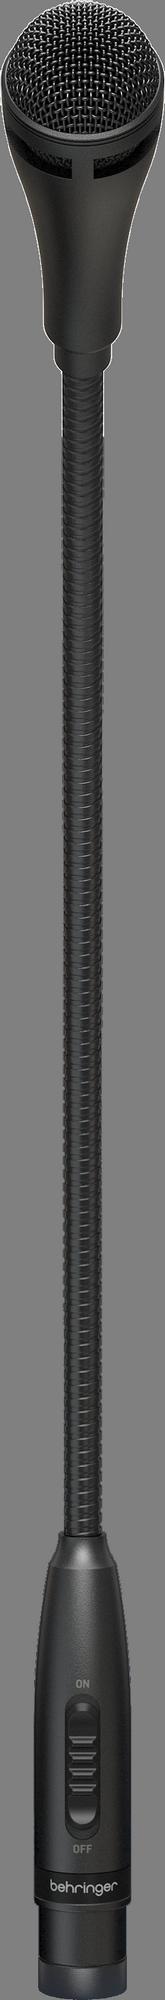 Behringer TA 312S - Gooseneck Microphone